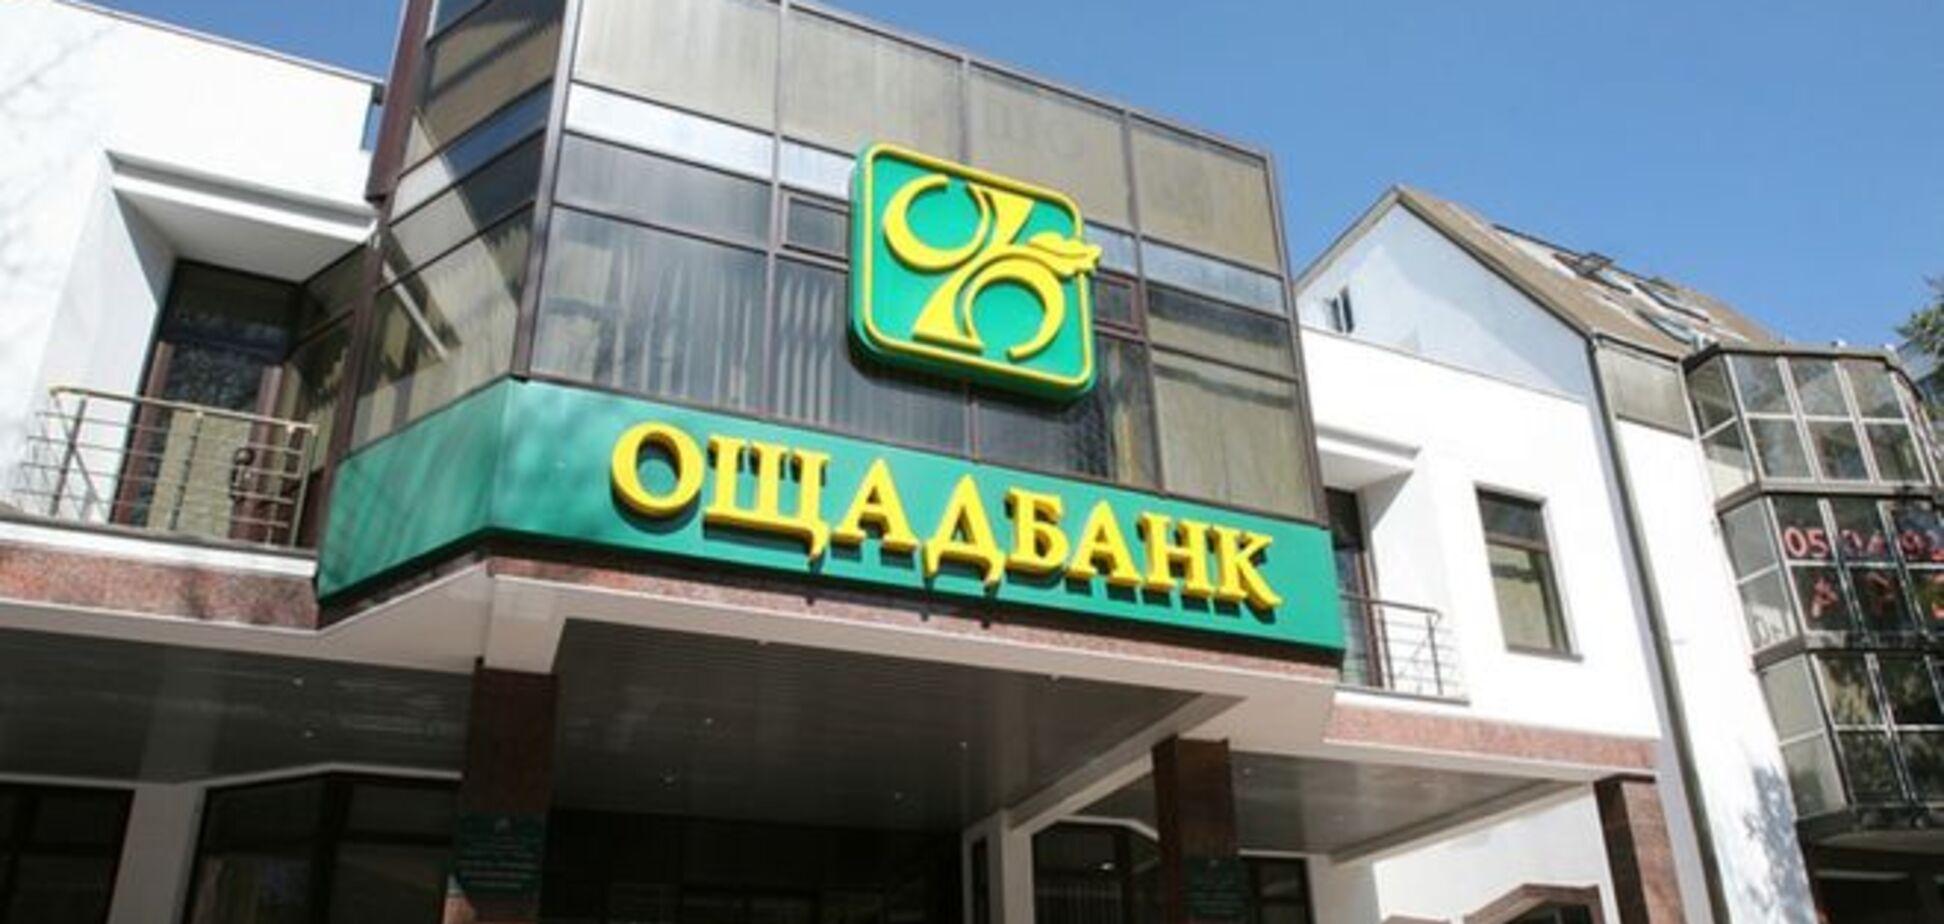 'Ощадбанк' останавливает прием платежей за коммуналку: названа причина